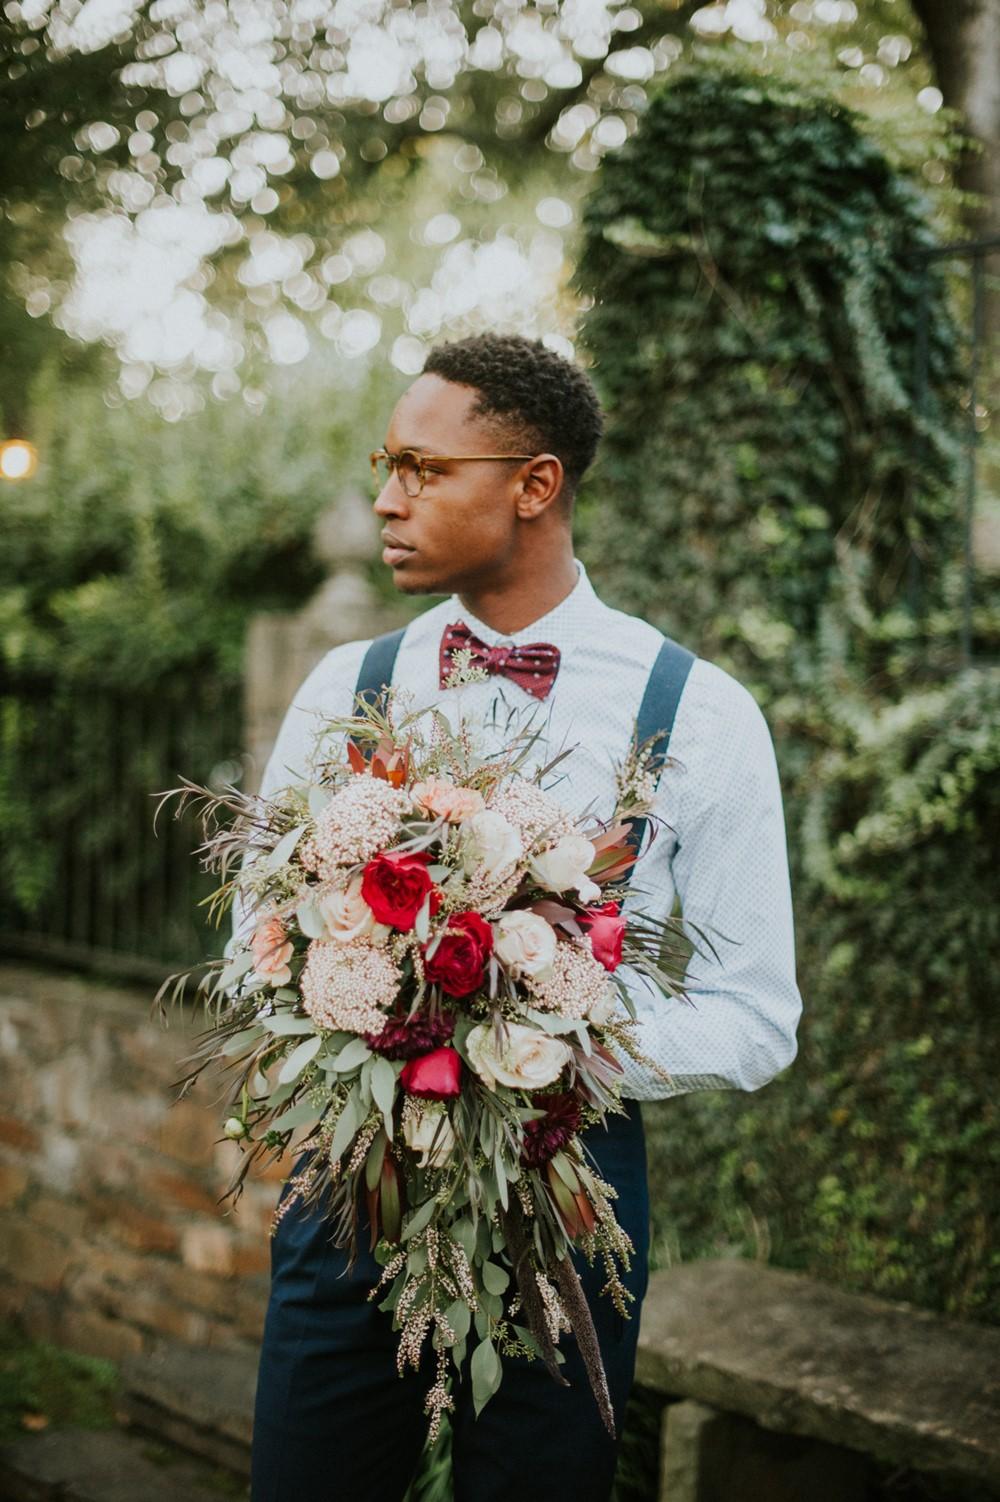 Retro Groom with a Bridal Bouquet // Photography ~ Myranda Randle Photography